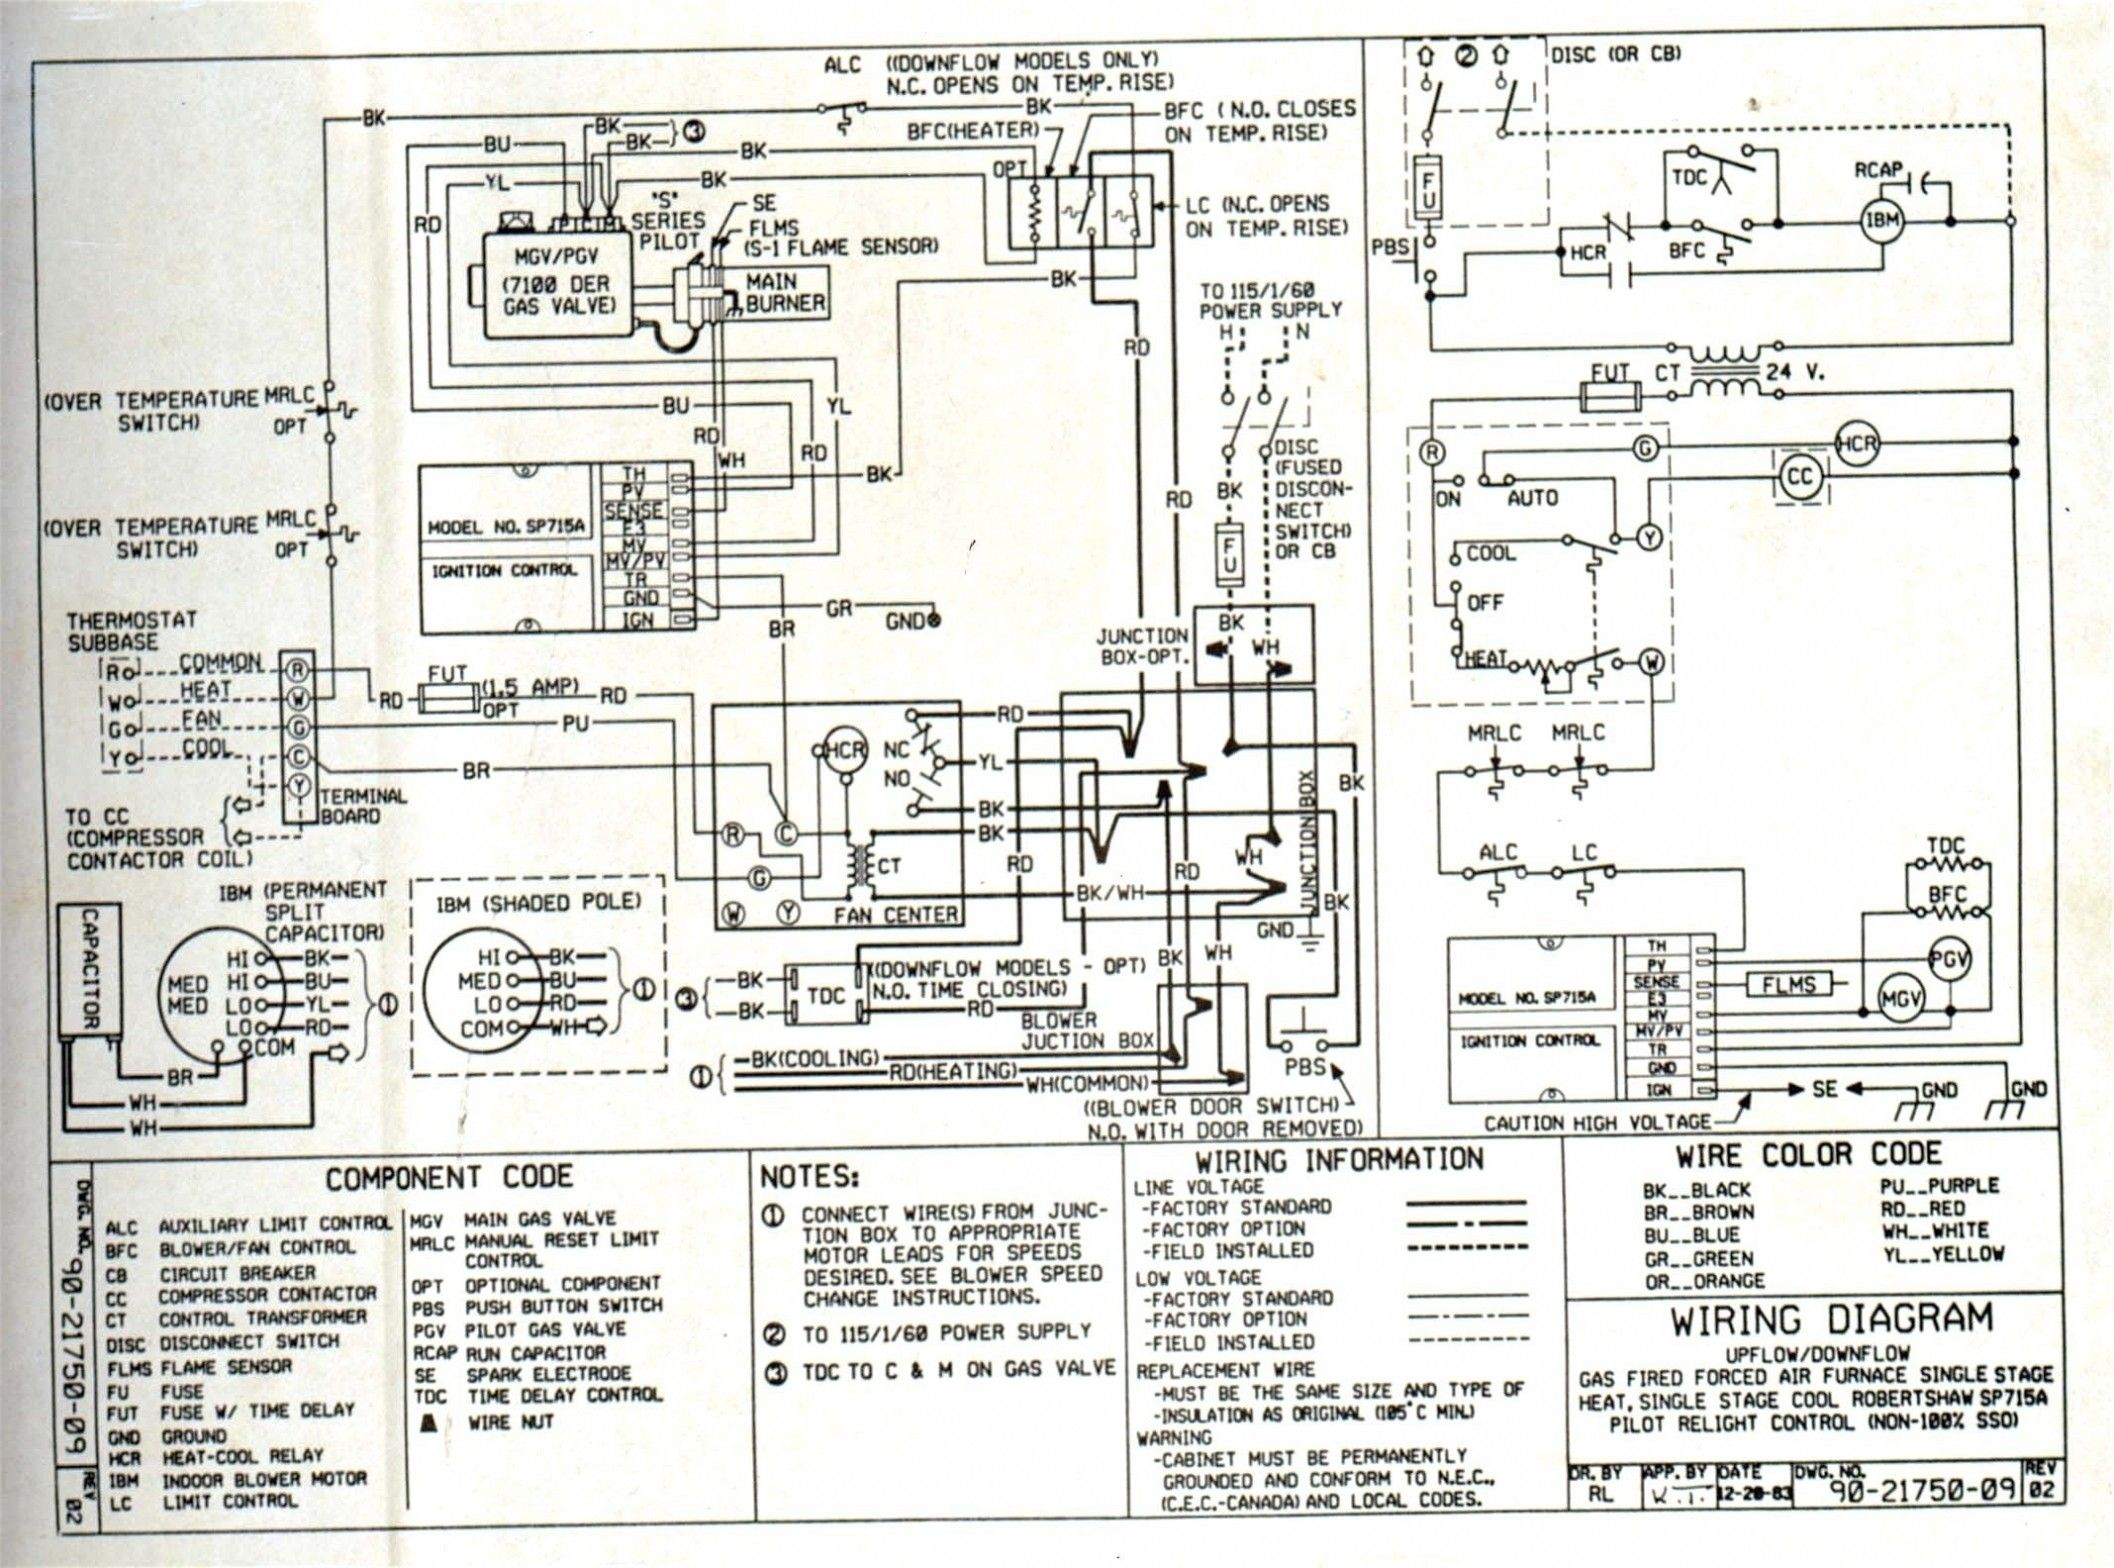 Unique Electrical Riser Diagram Template Diagram Wiringdiagram Diagramming Diagramm Visuals Visualisati Electrical Diagram Diagram Trailer Wiring Diagram